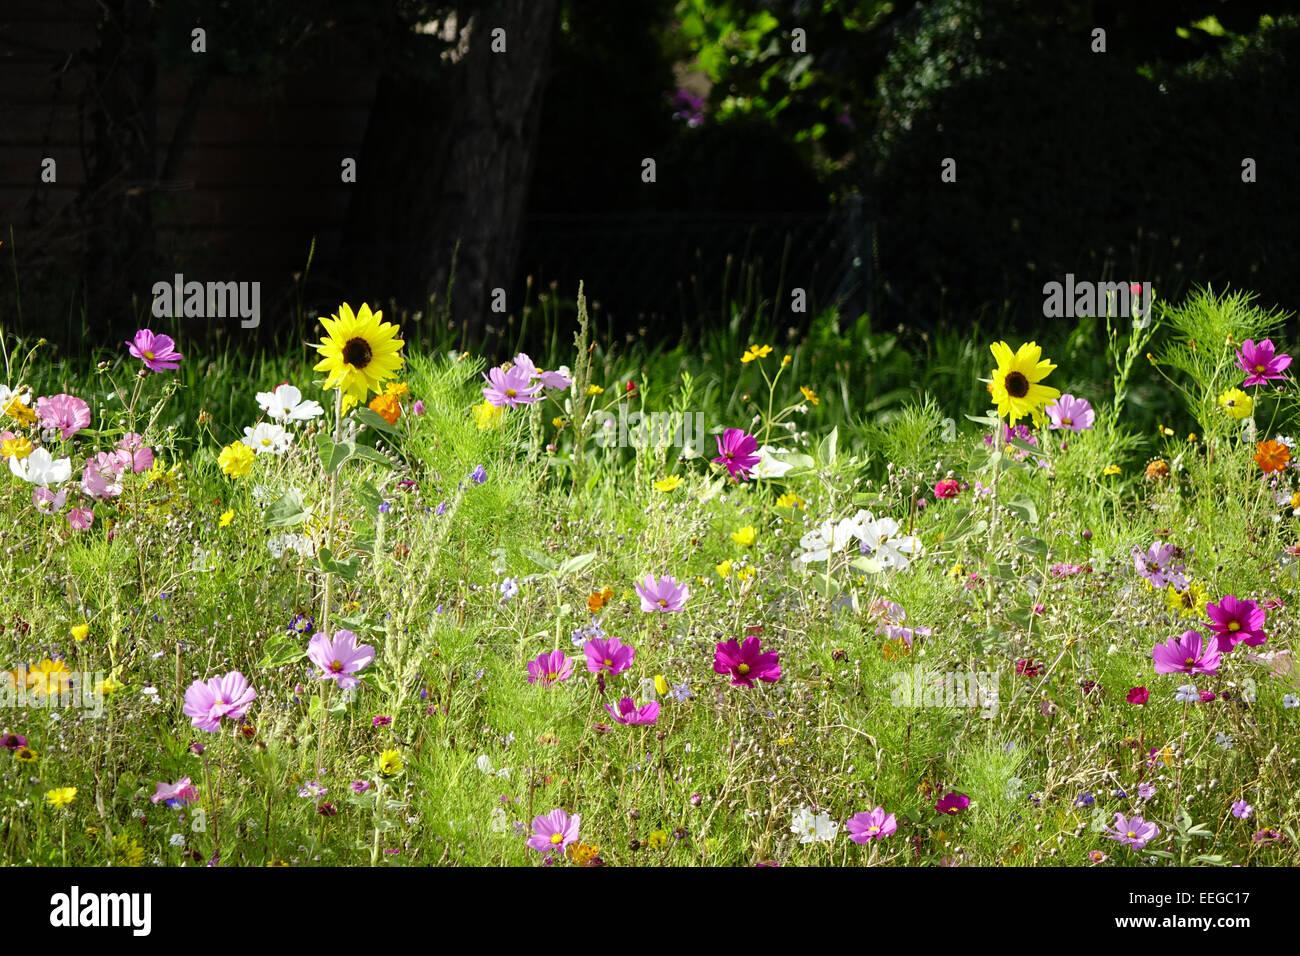 Bunte Blumenwiese im Sommer, fiori colorati in prato in estate, esterno, millefiori, fiori selvatici, prati, prati, Immagini Stock